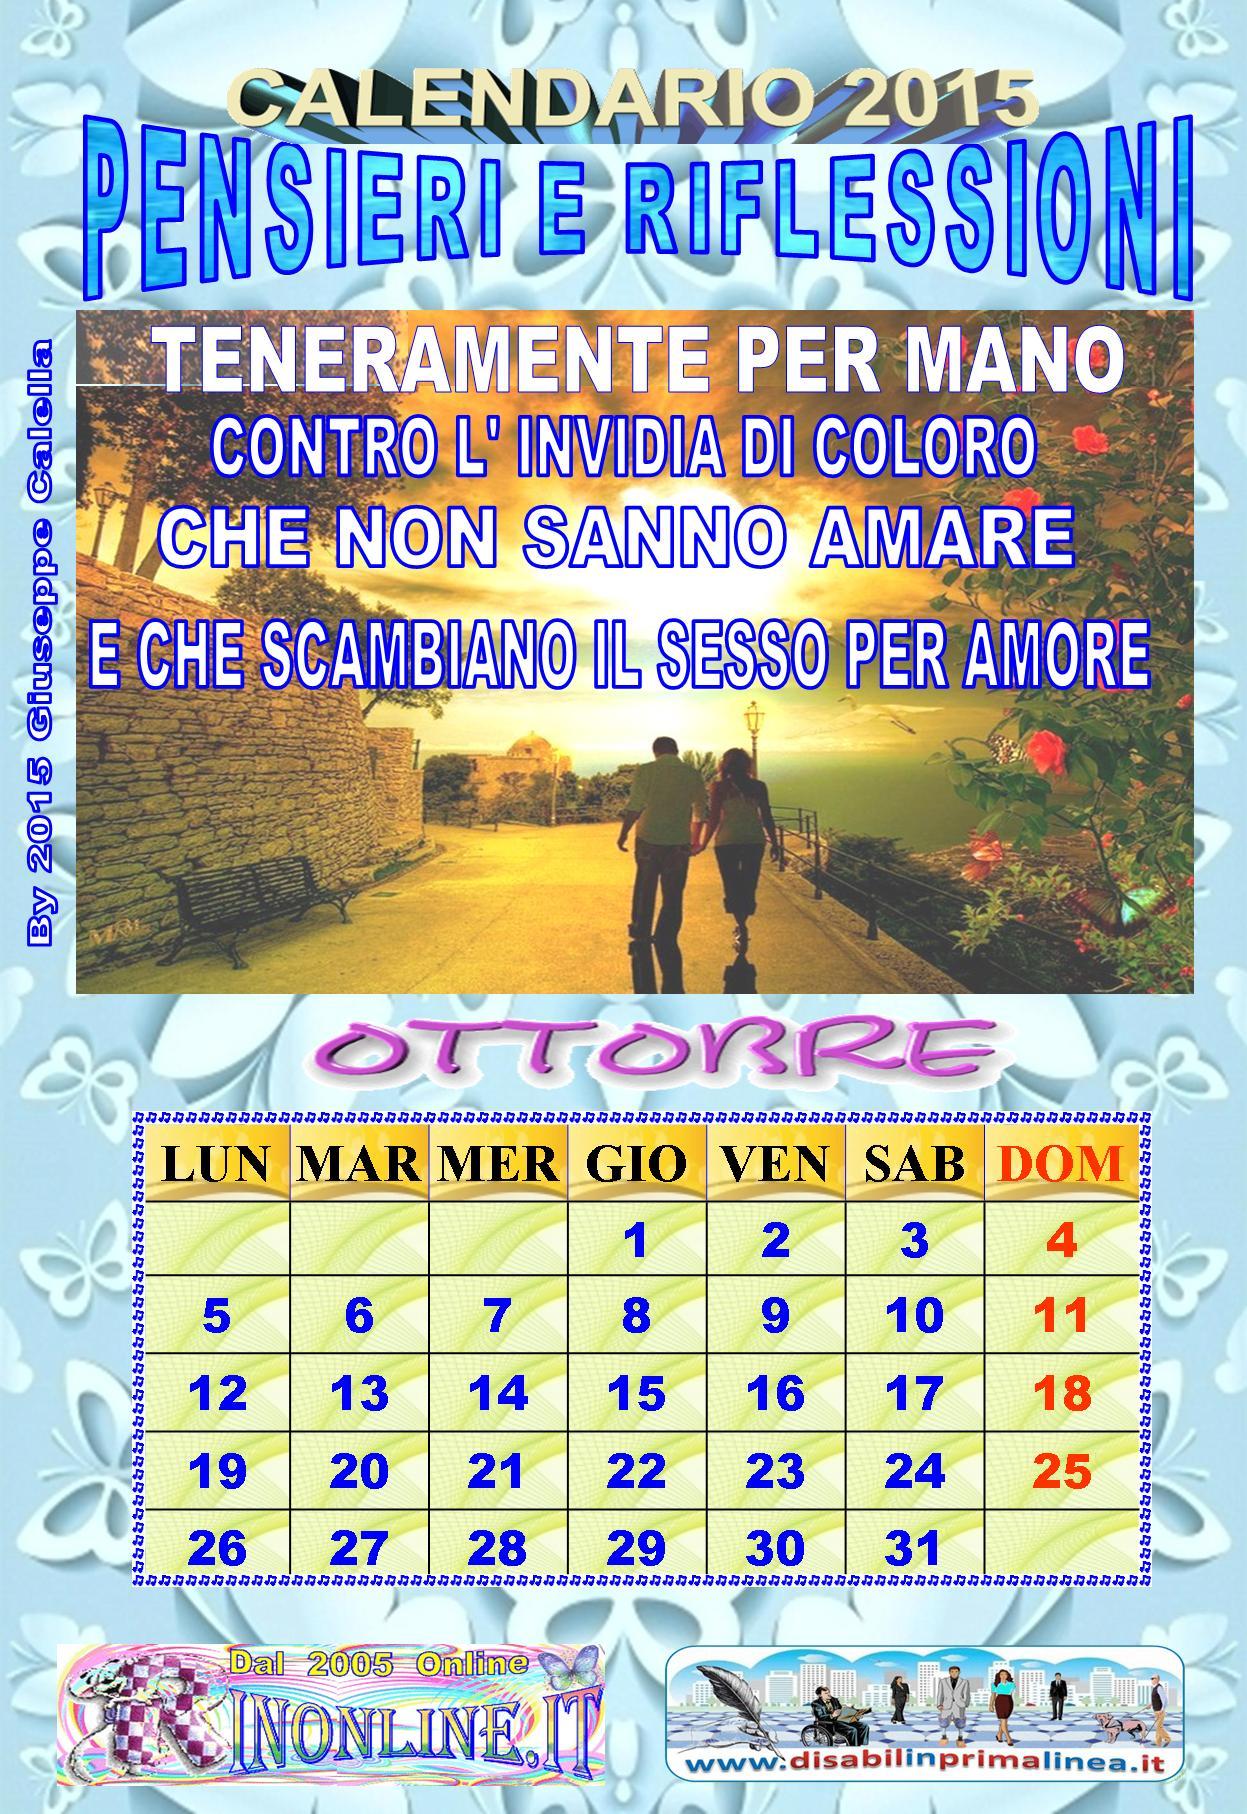 ottobre_calendario_2015_pensieri_riflessioni_giuseppe_calella